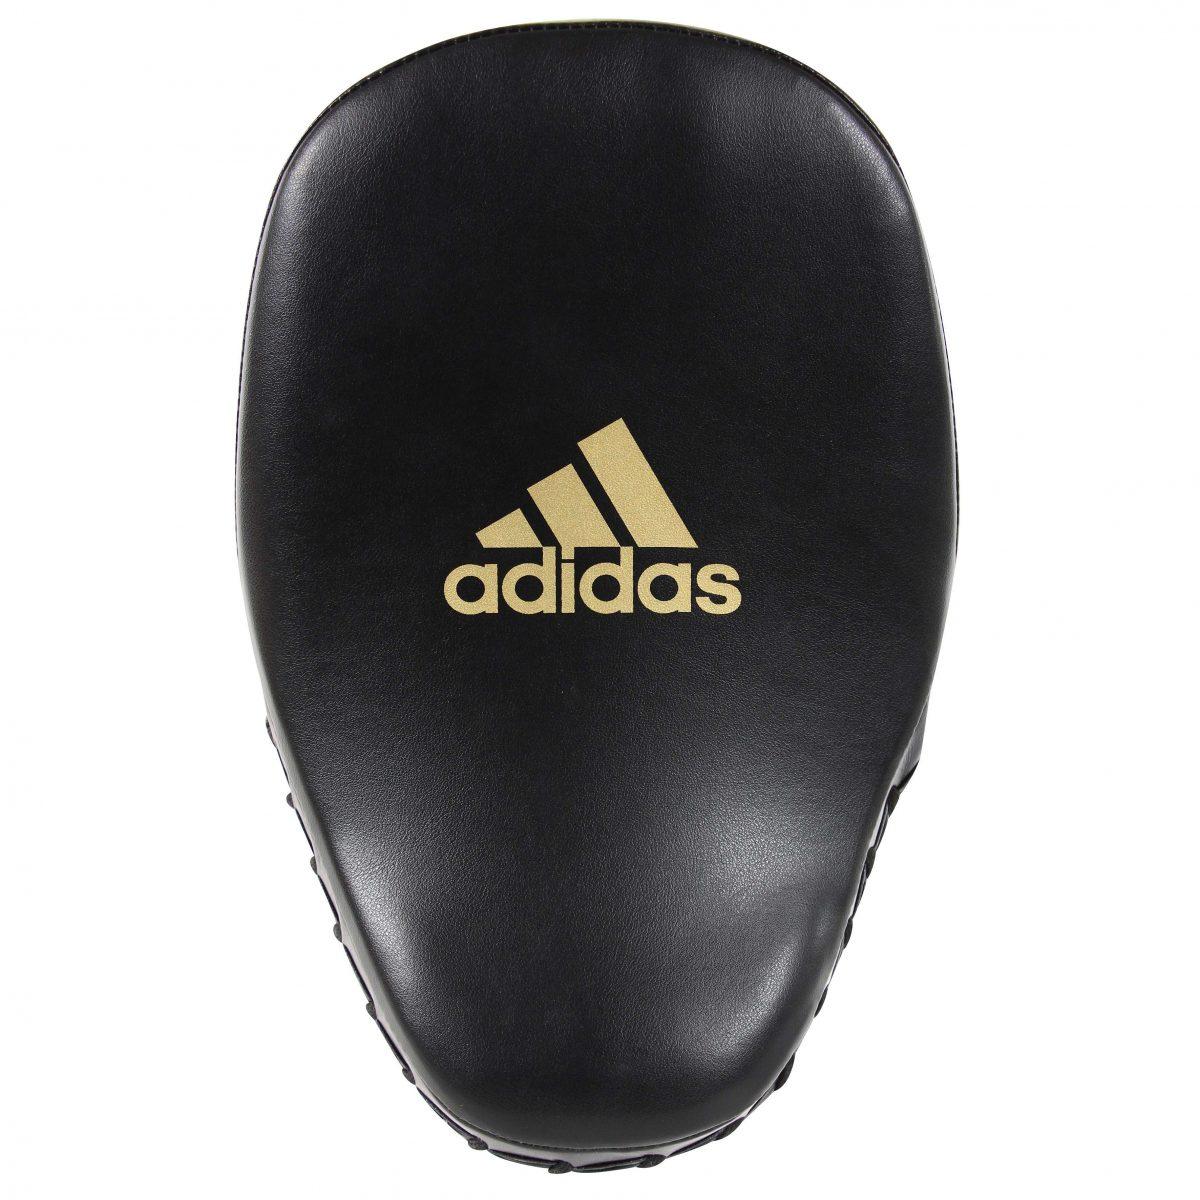 "Adidas Handpratze ""Curved"" - Fitnessgeräte - Adidas"